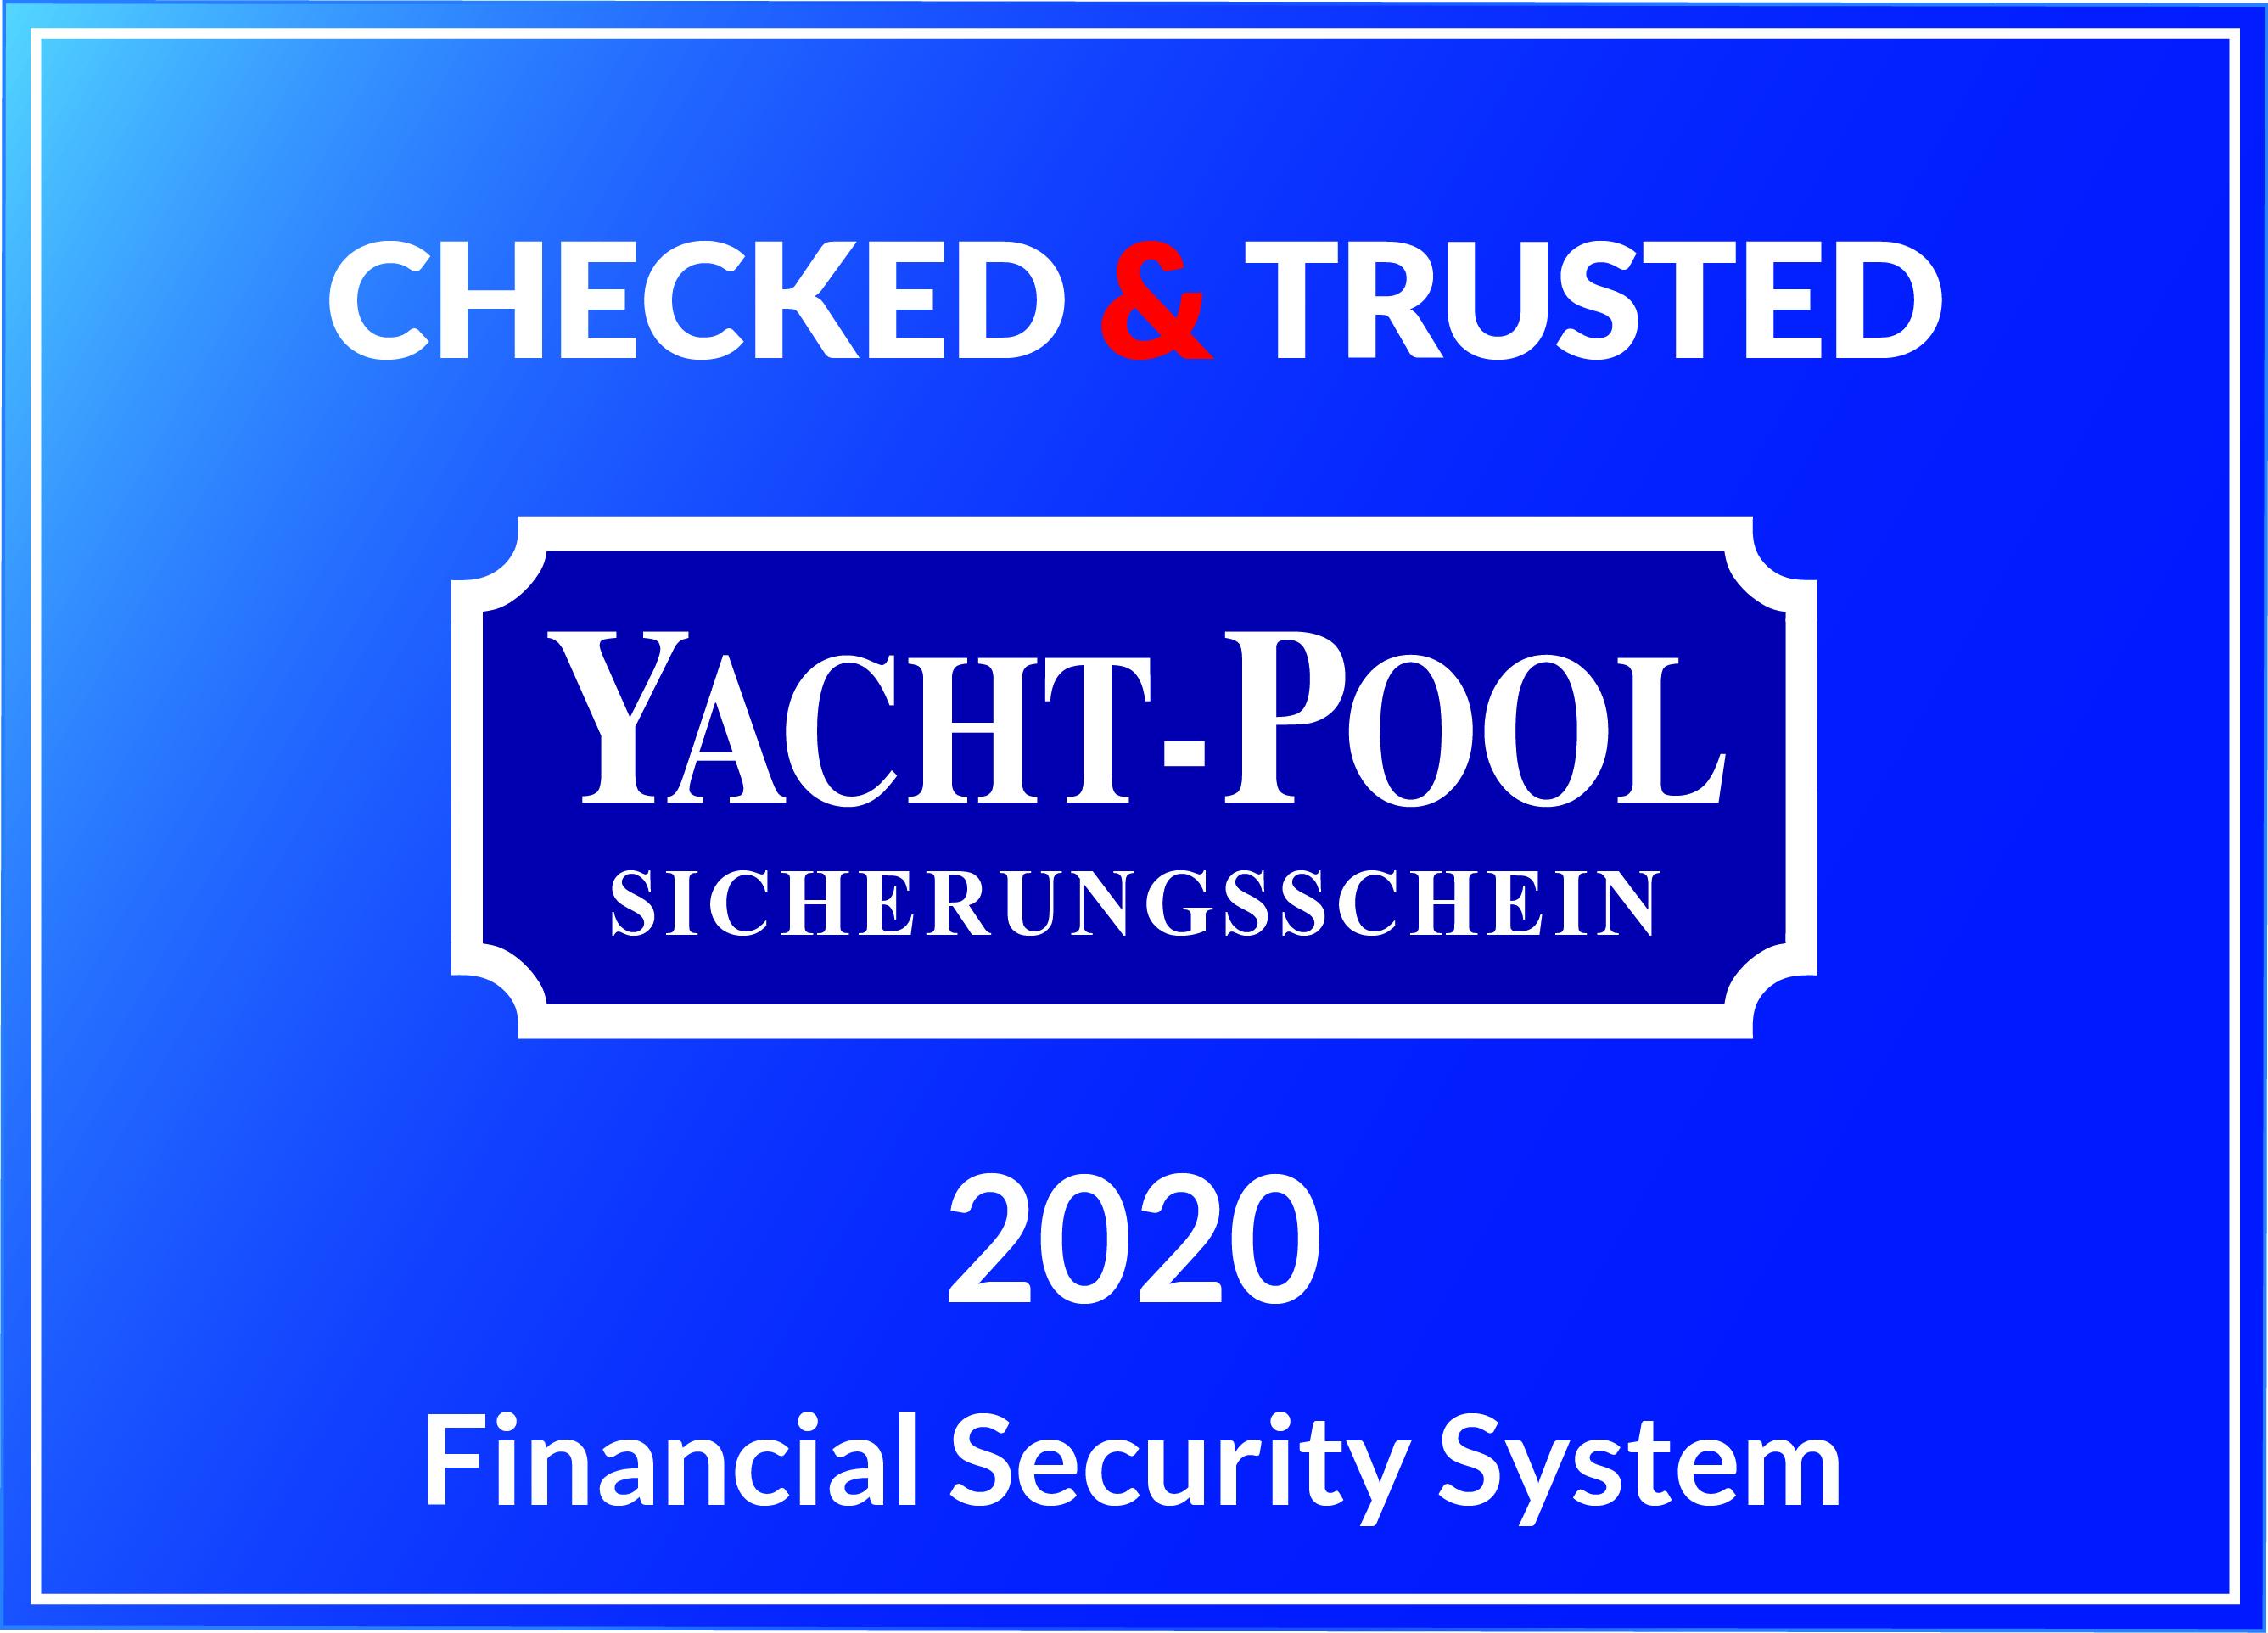 Yacht Pool 2020